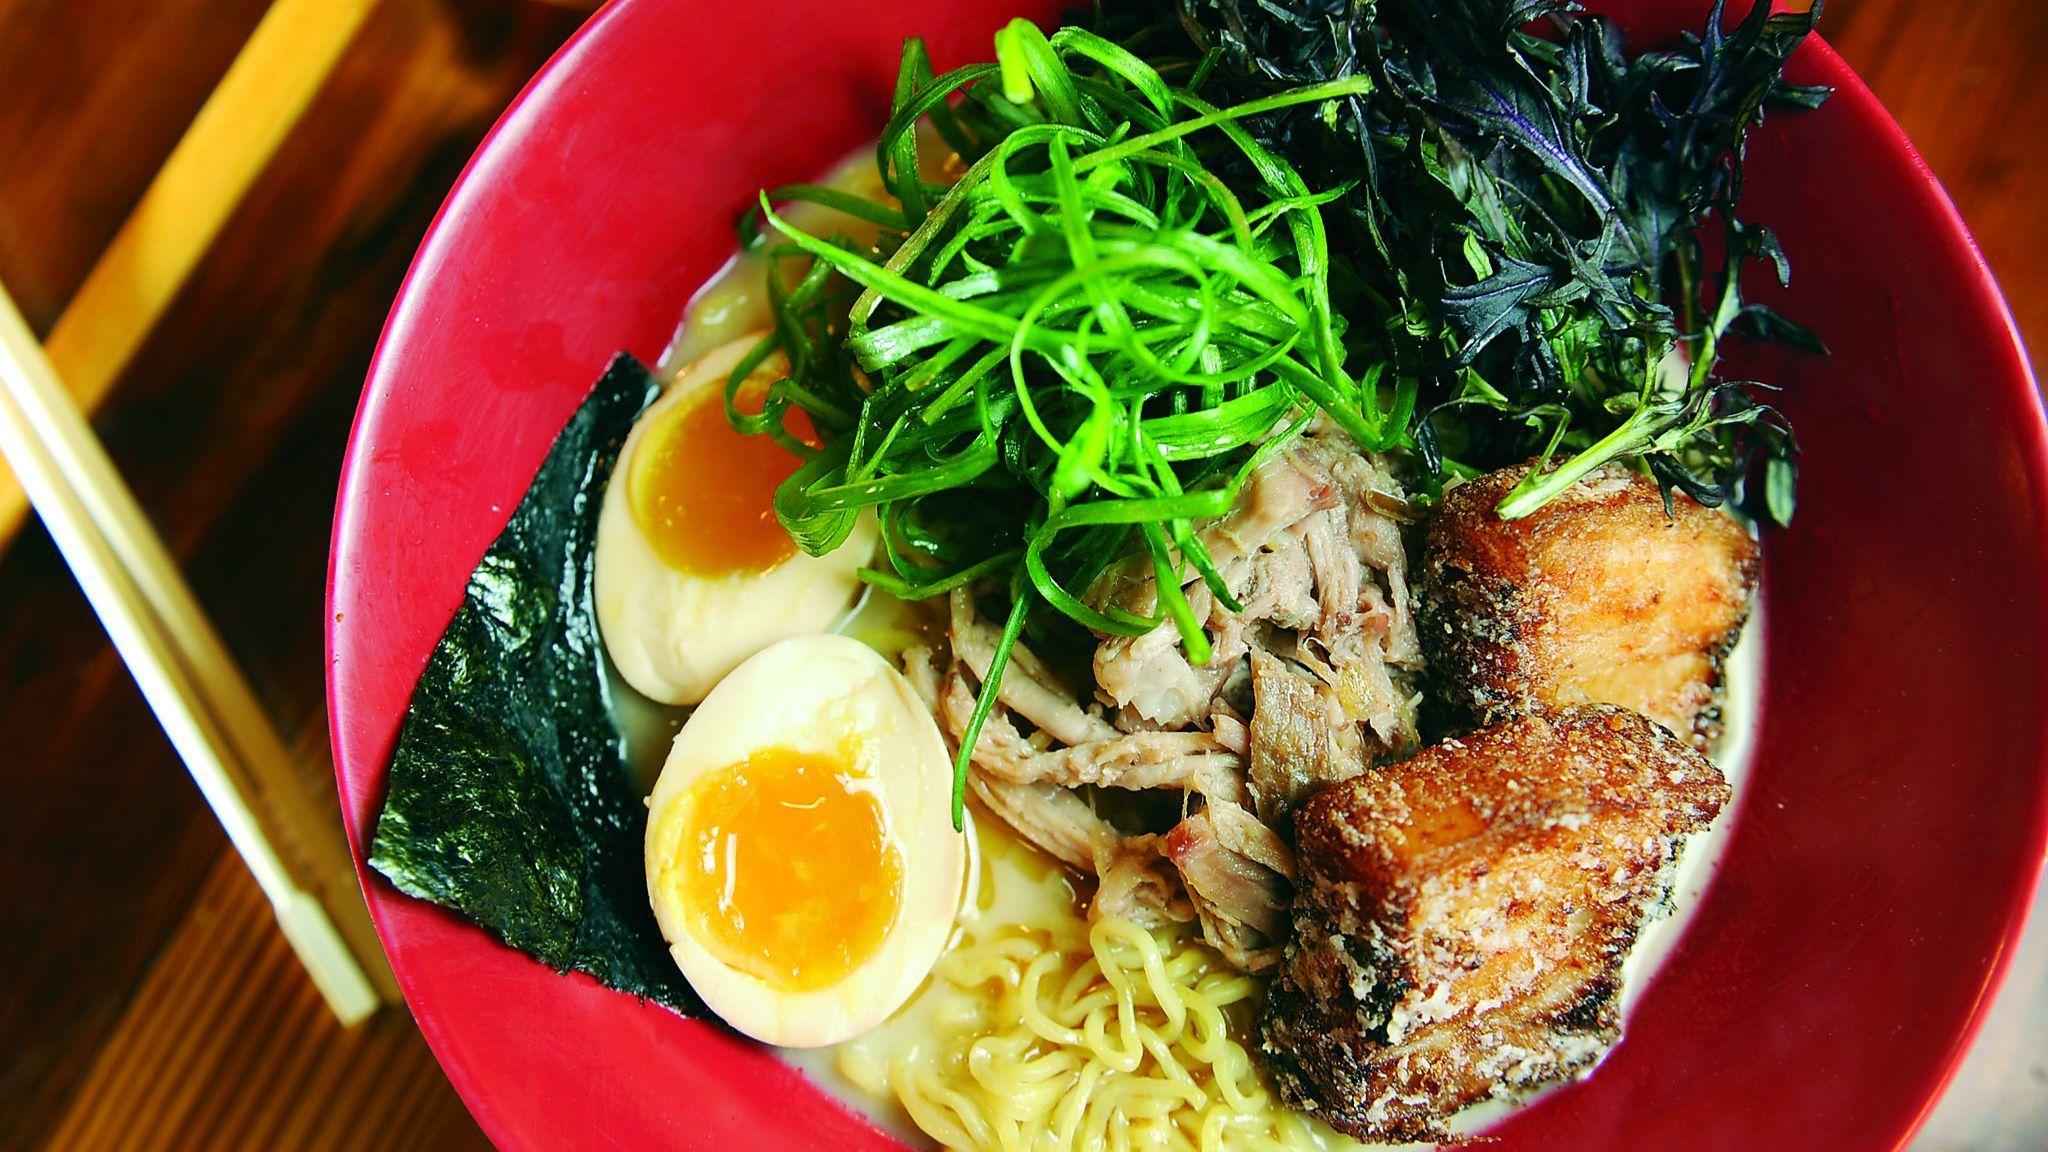 03/31/15 -- Baltimore, MD -- Tonkotsu ramen at Ejji Ramen includes pork broth with char su pulled